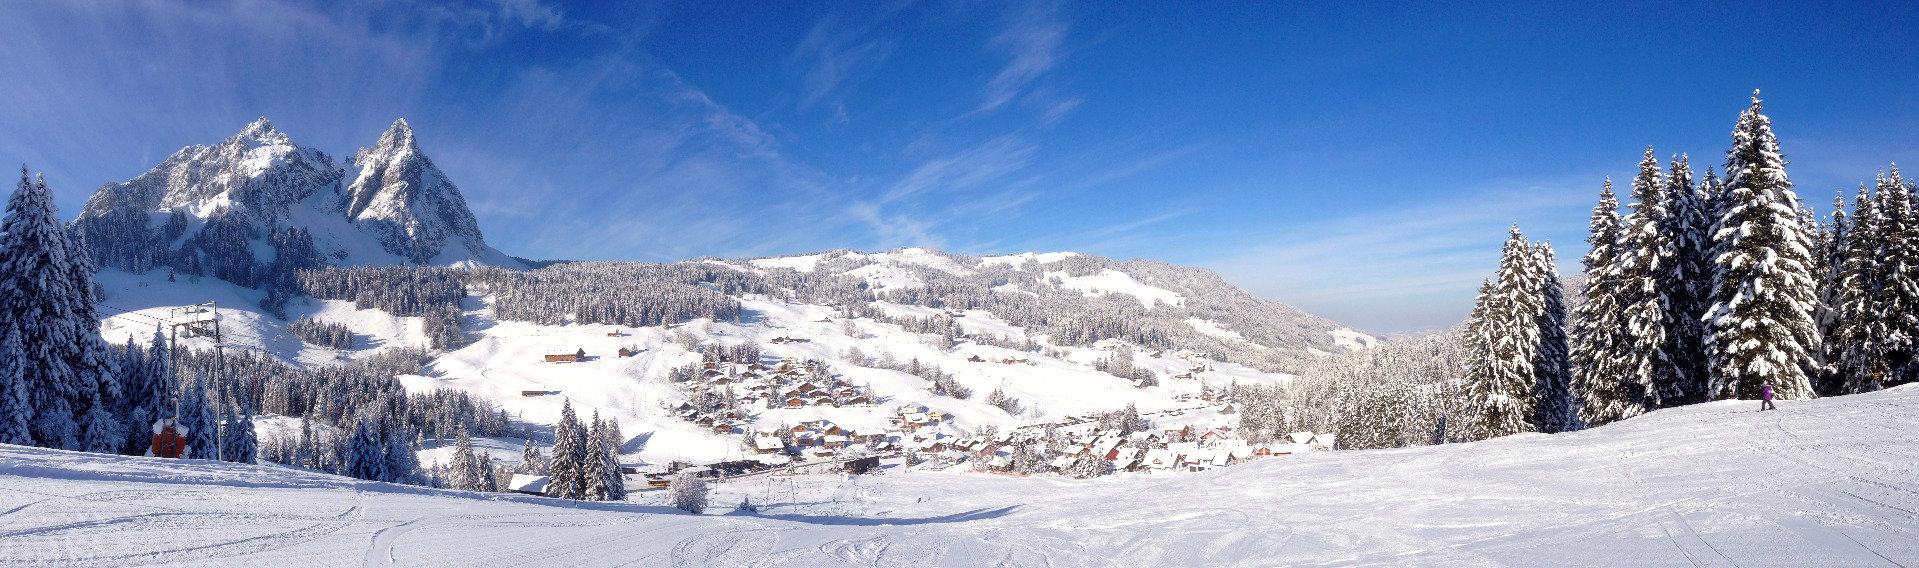 Blick ins Tal auf den Ort Brunni - © www.brunnialpthal.ch